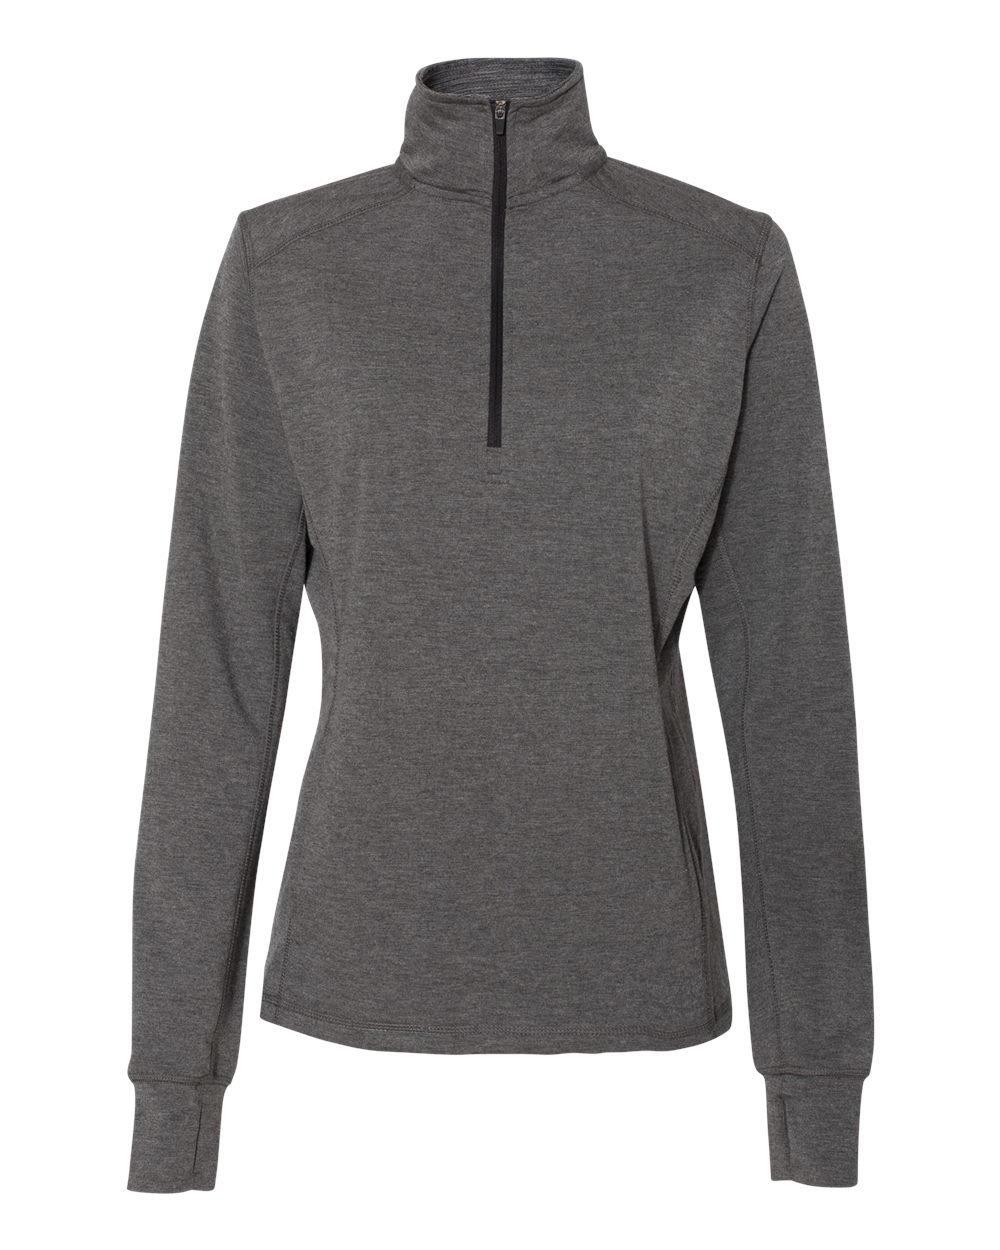 Omega 1/2 Zip Pullover